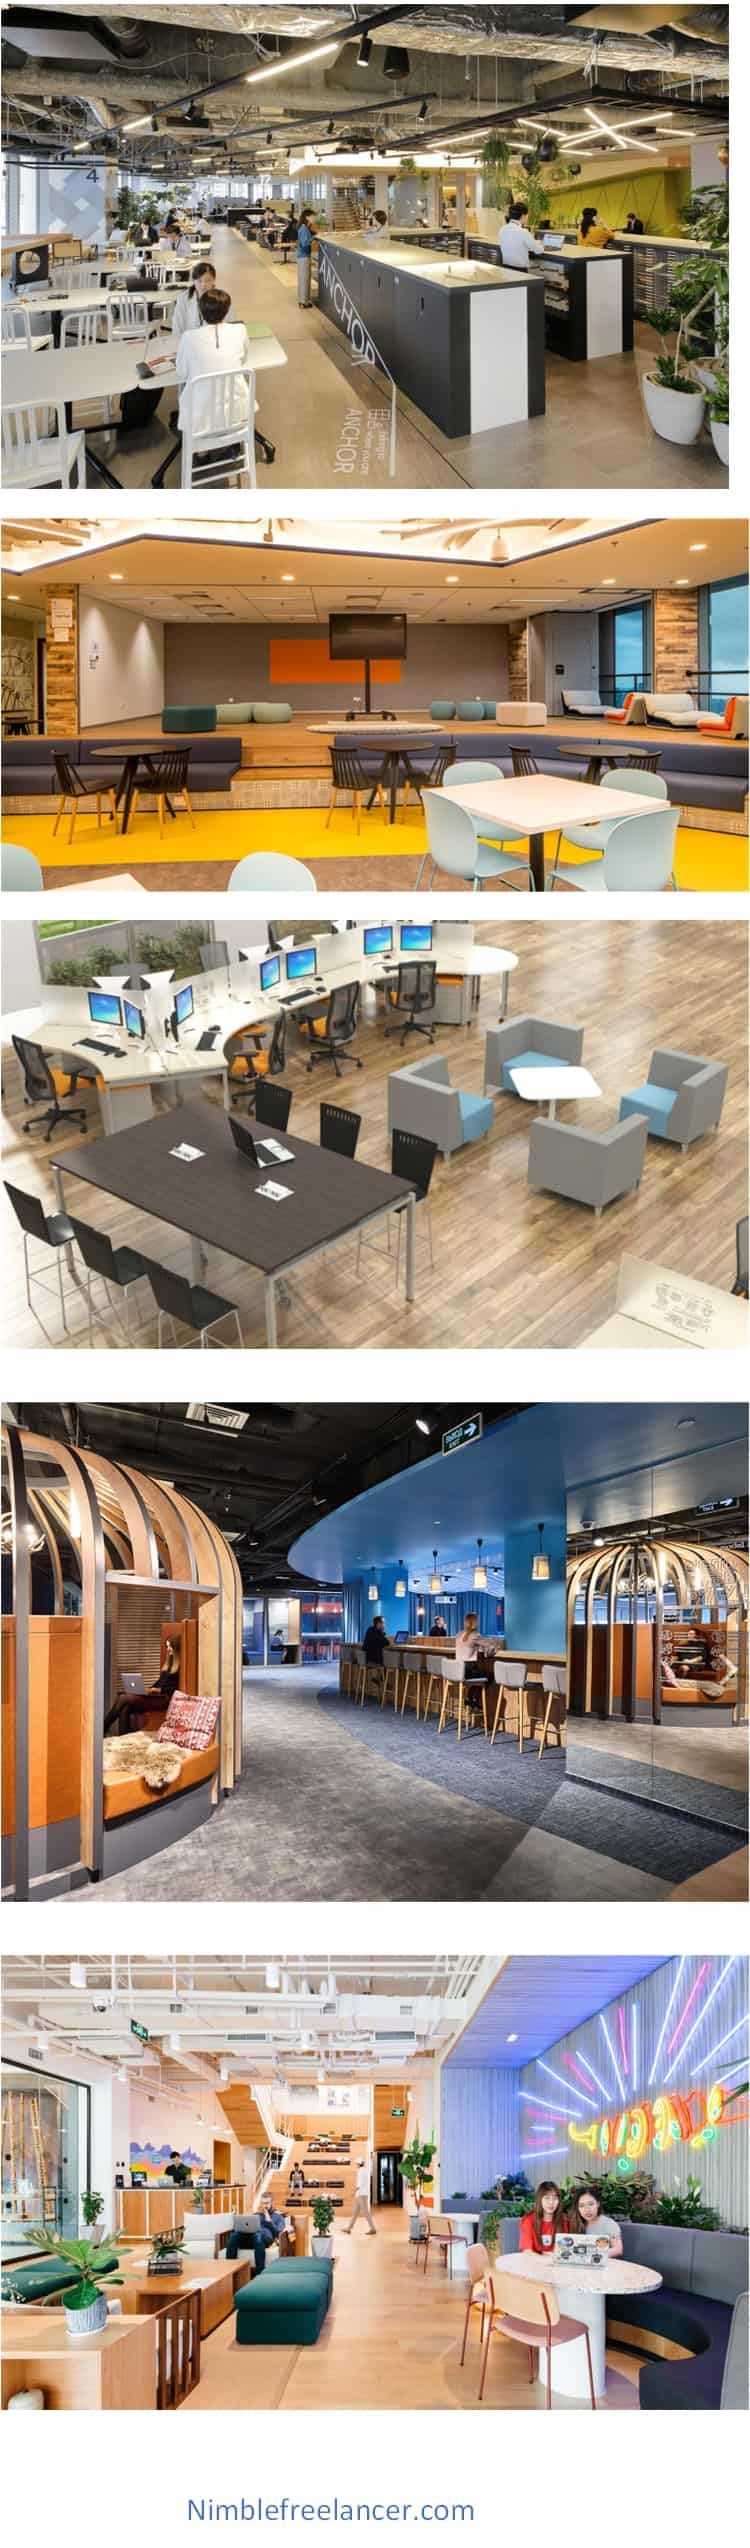 activity based workspace design